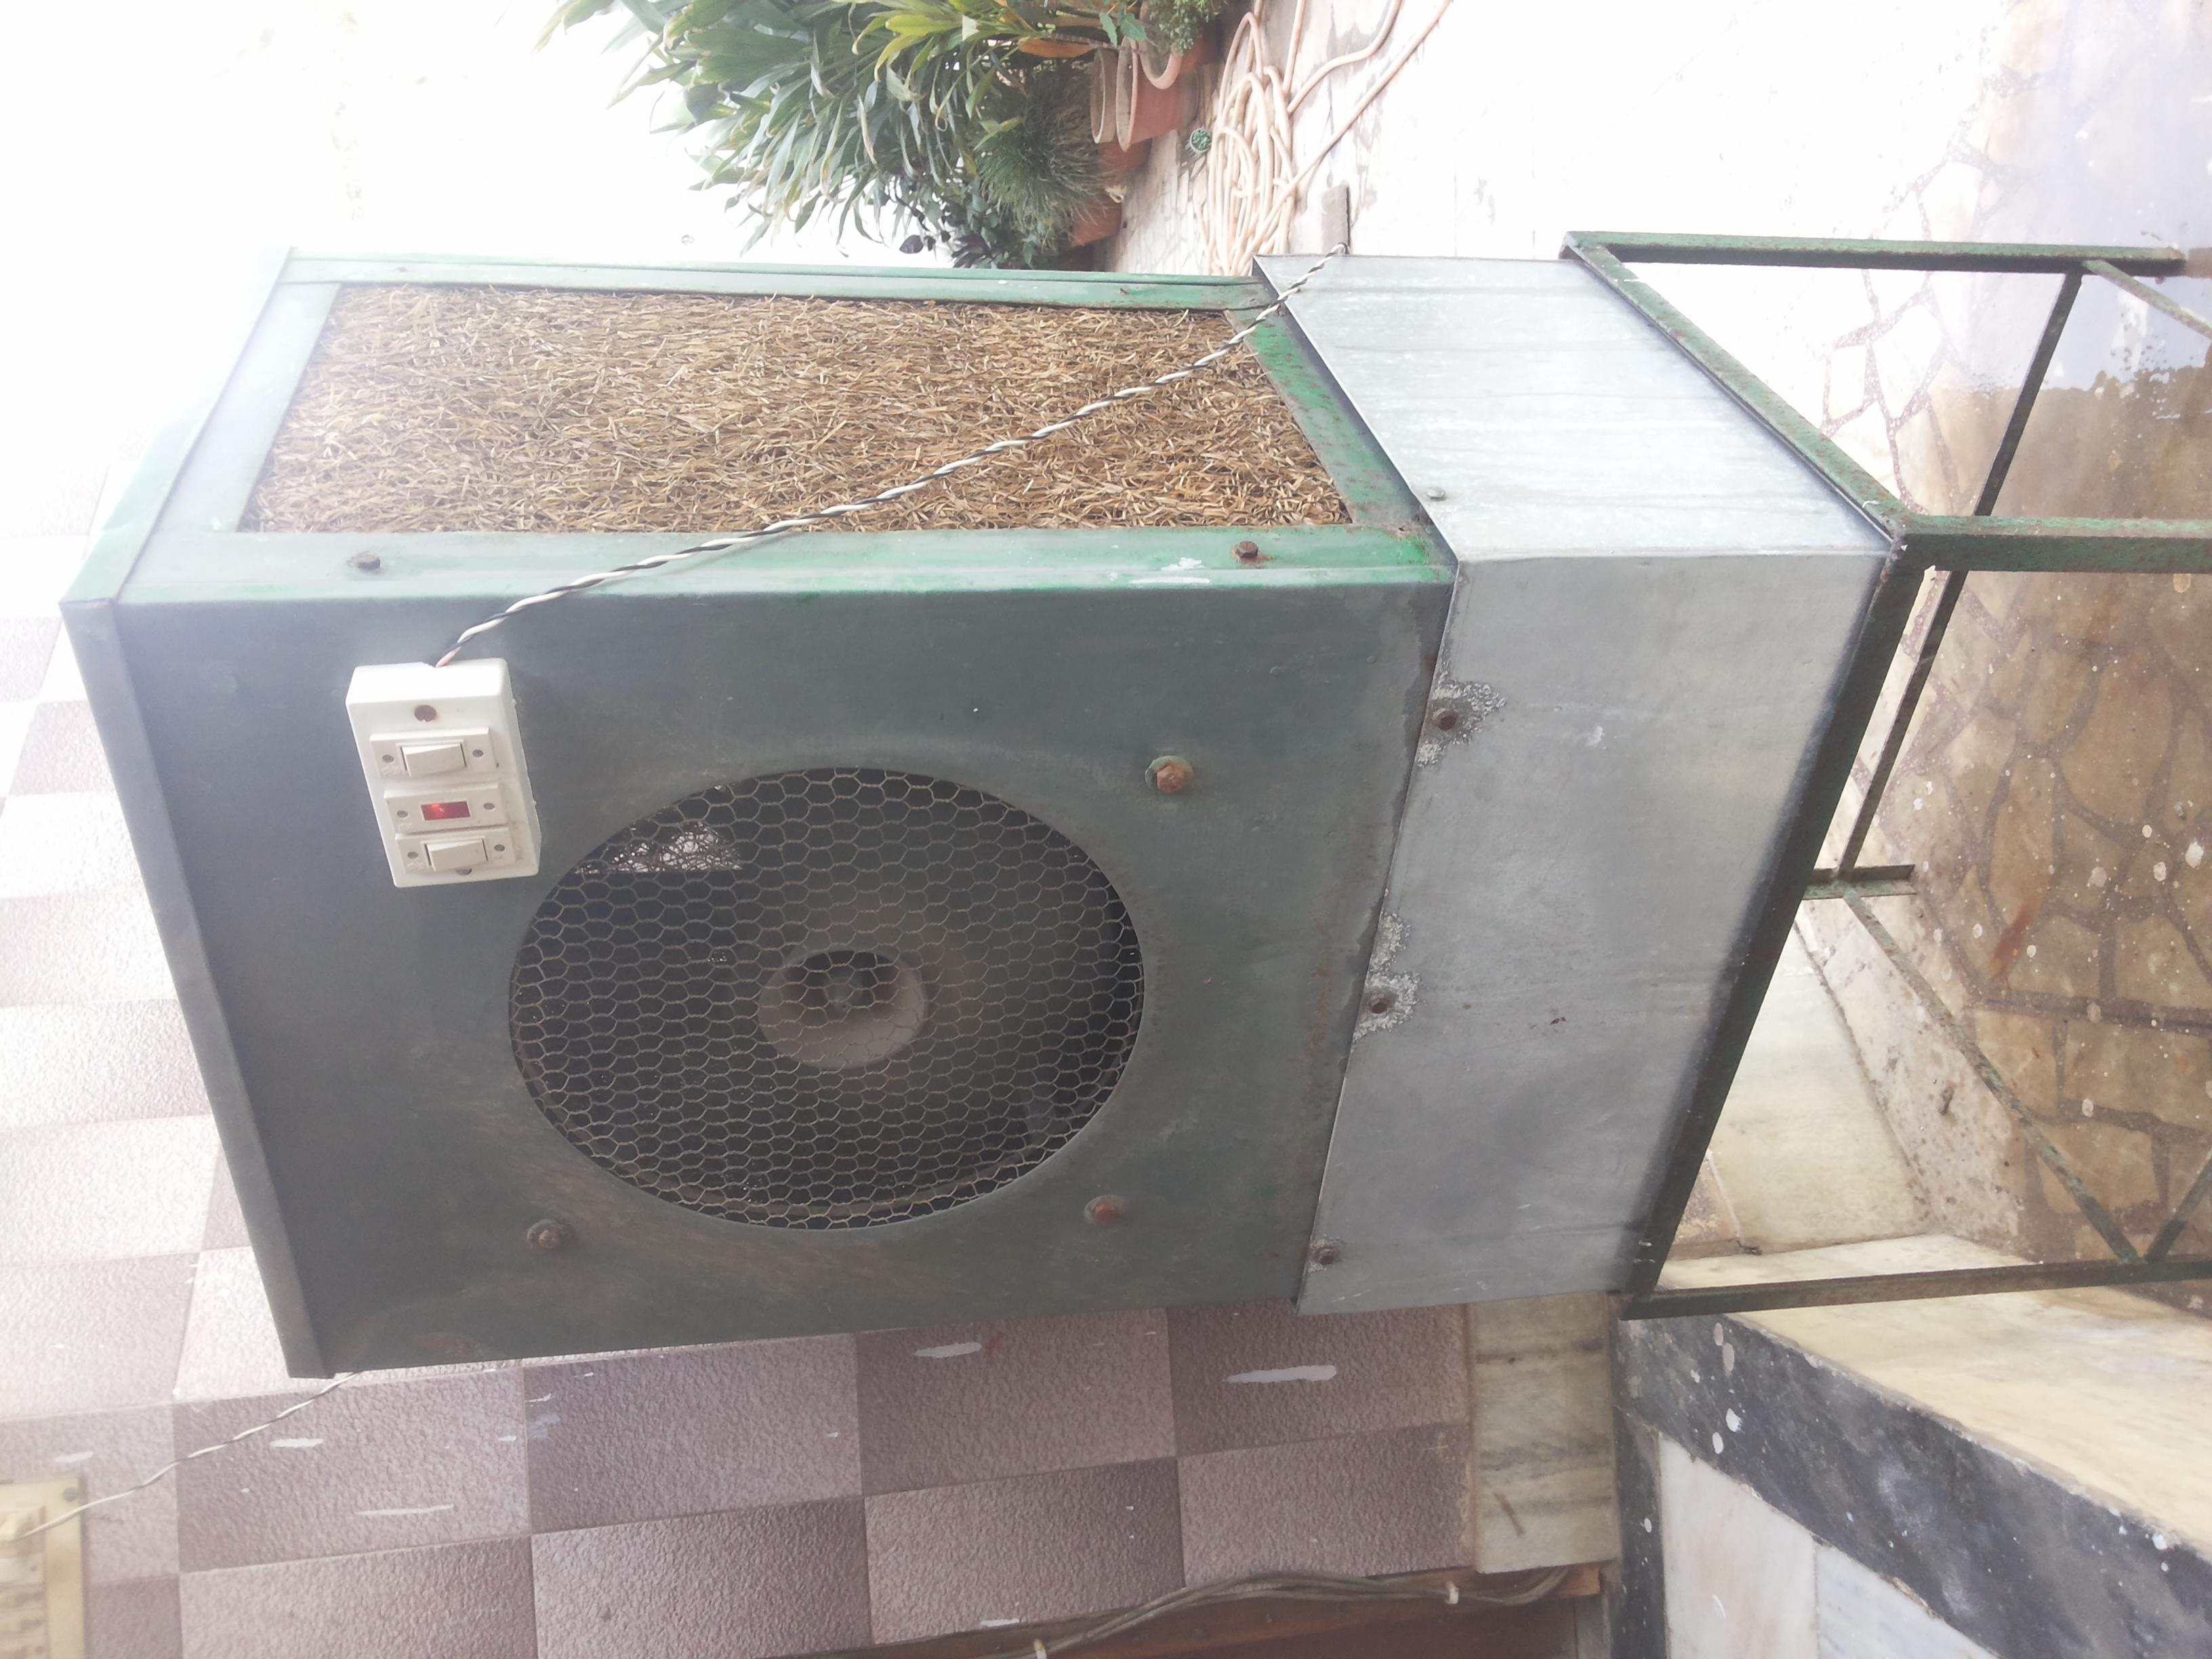 Evaporative Cooler Wiki Everipedia